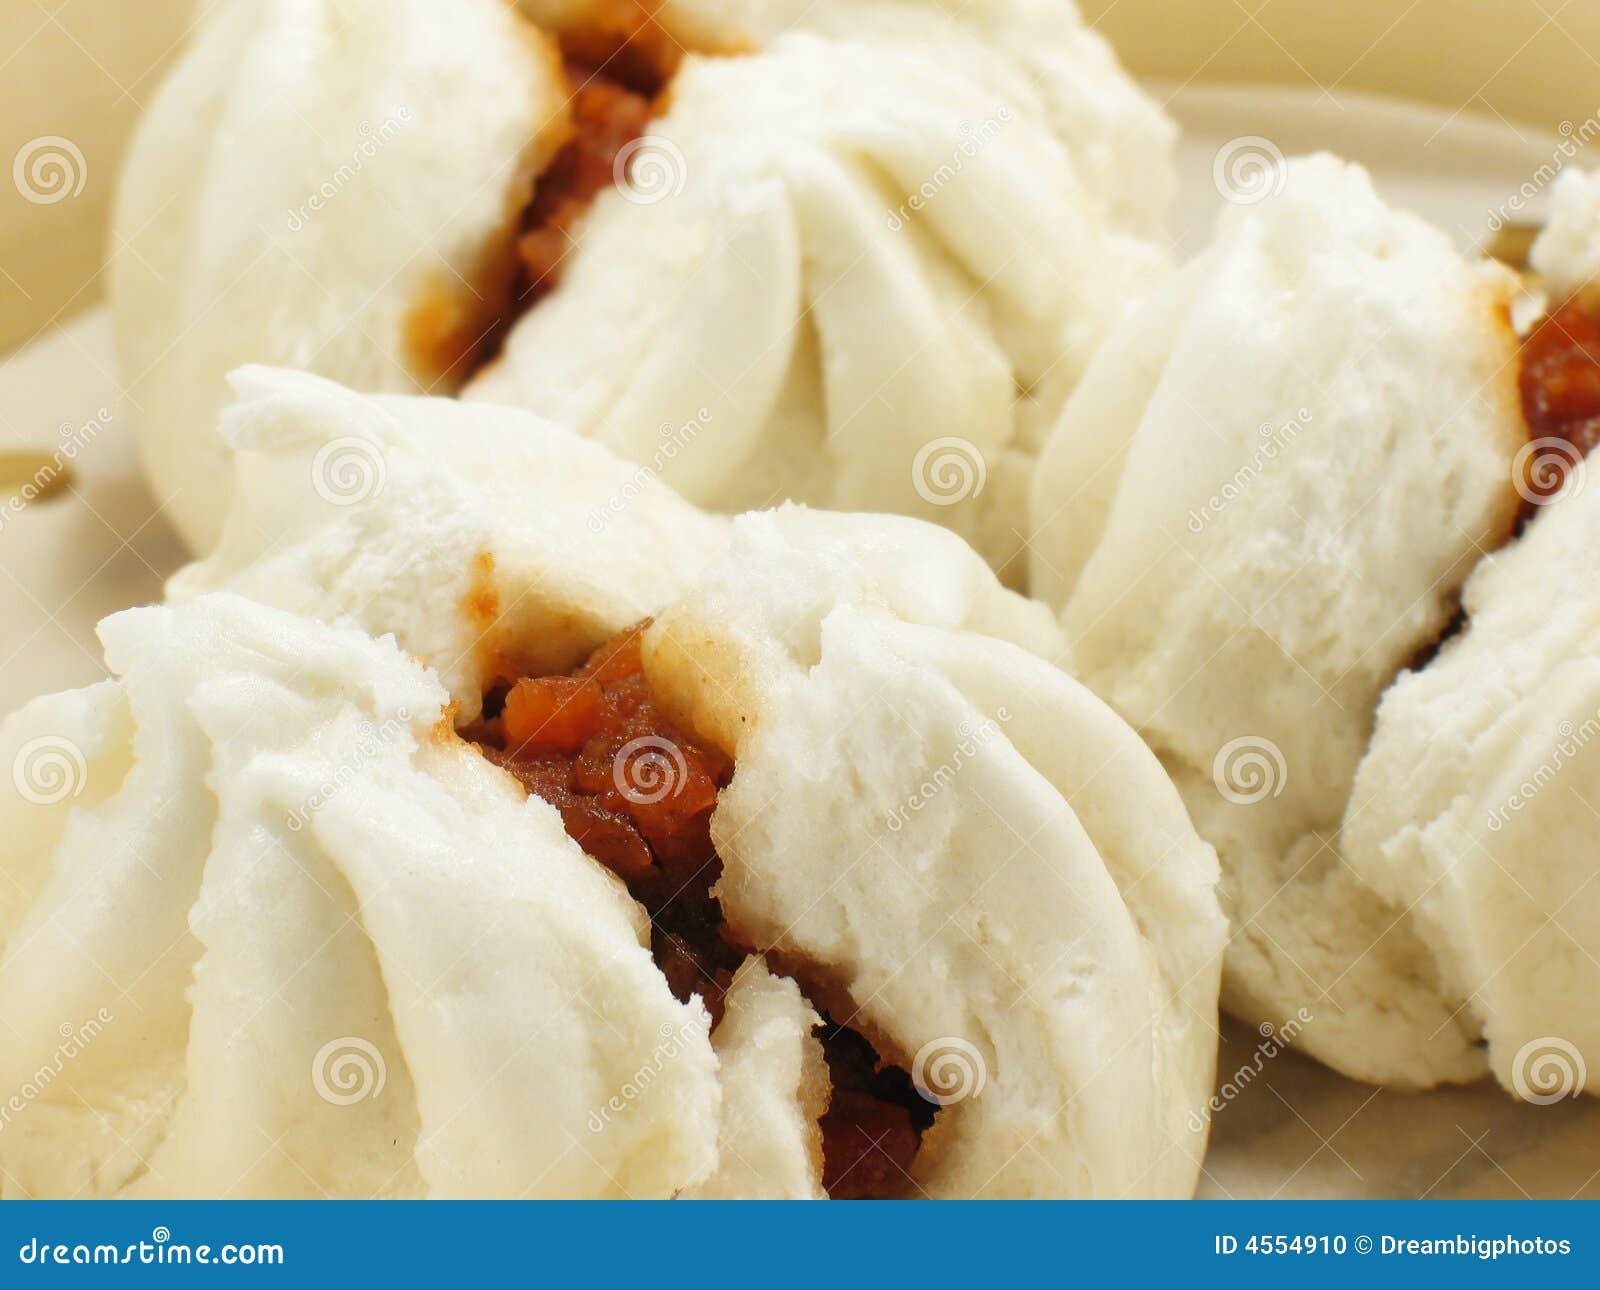 Chinese BBQ pork buns (char siu bao).